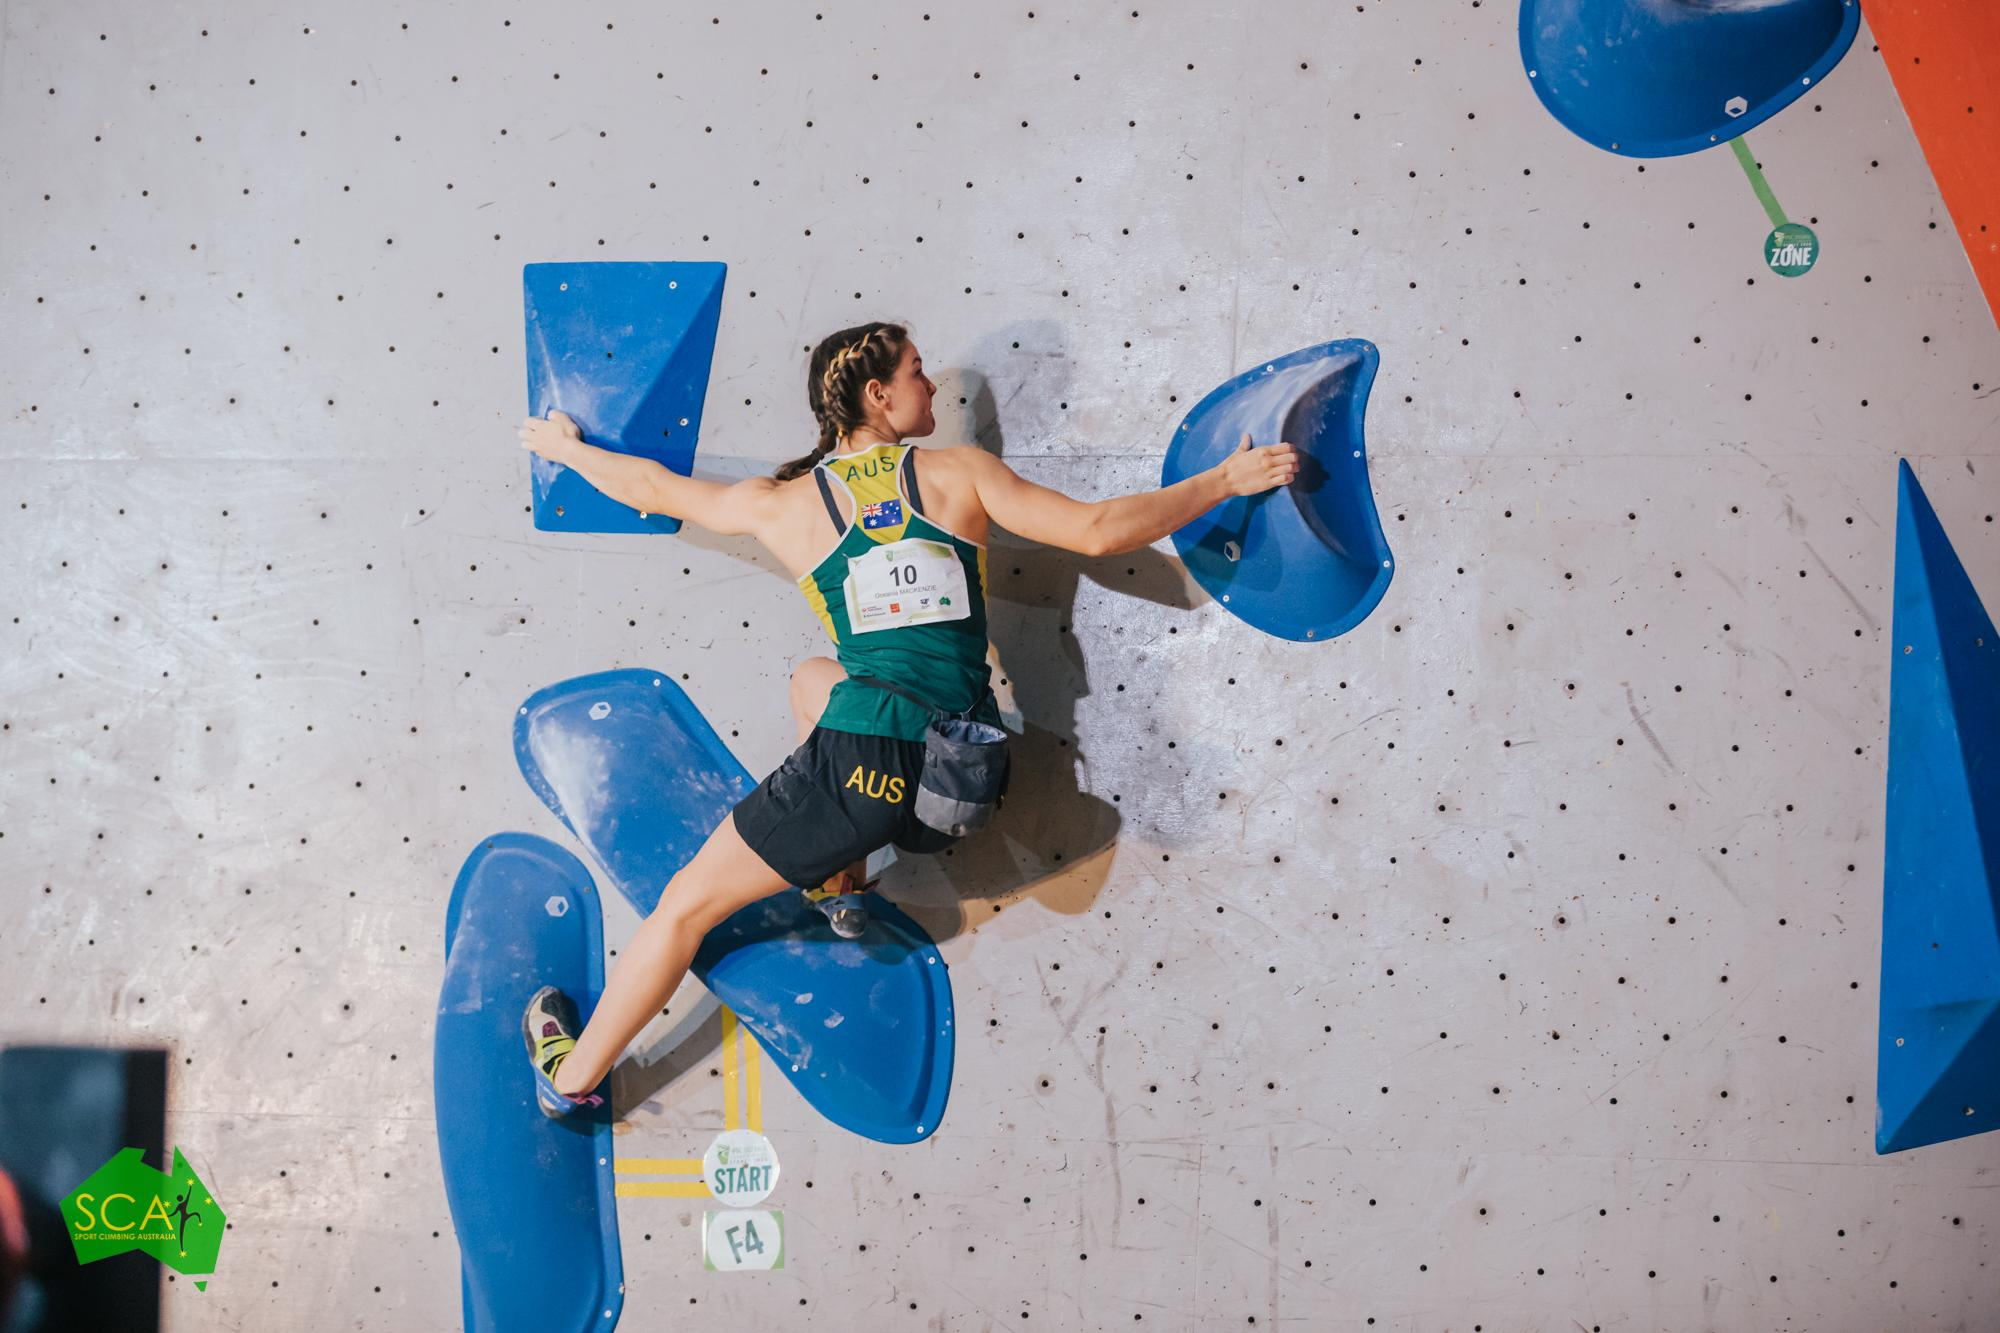 201220 IFSC News OHalloran and Mackenzie to represent Australia at Tokyo 2020